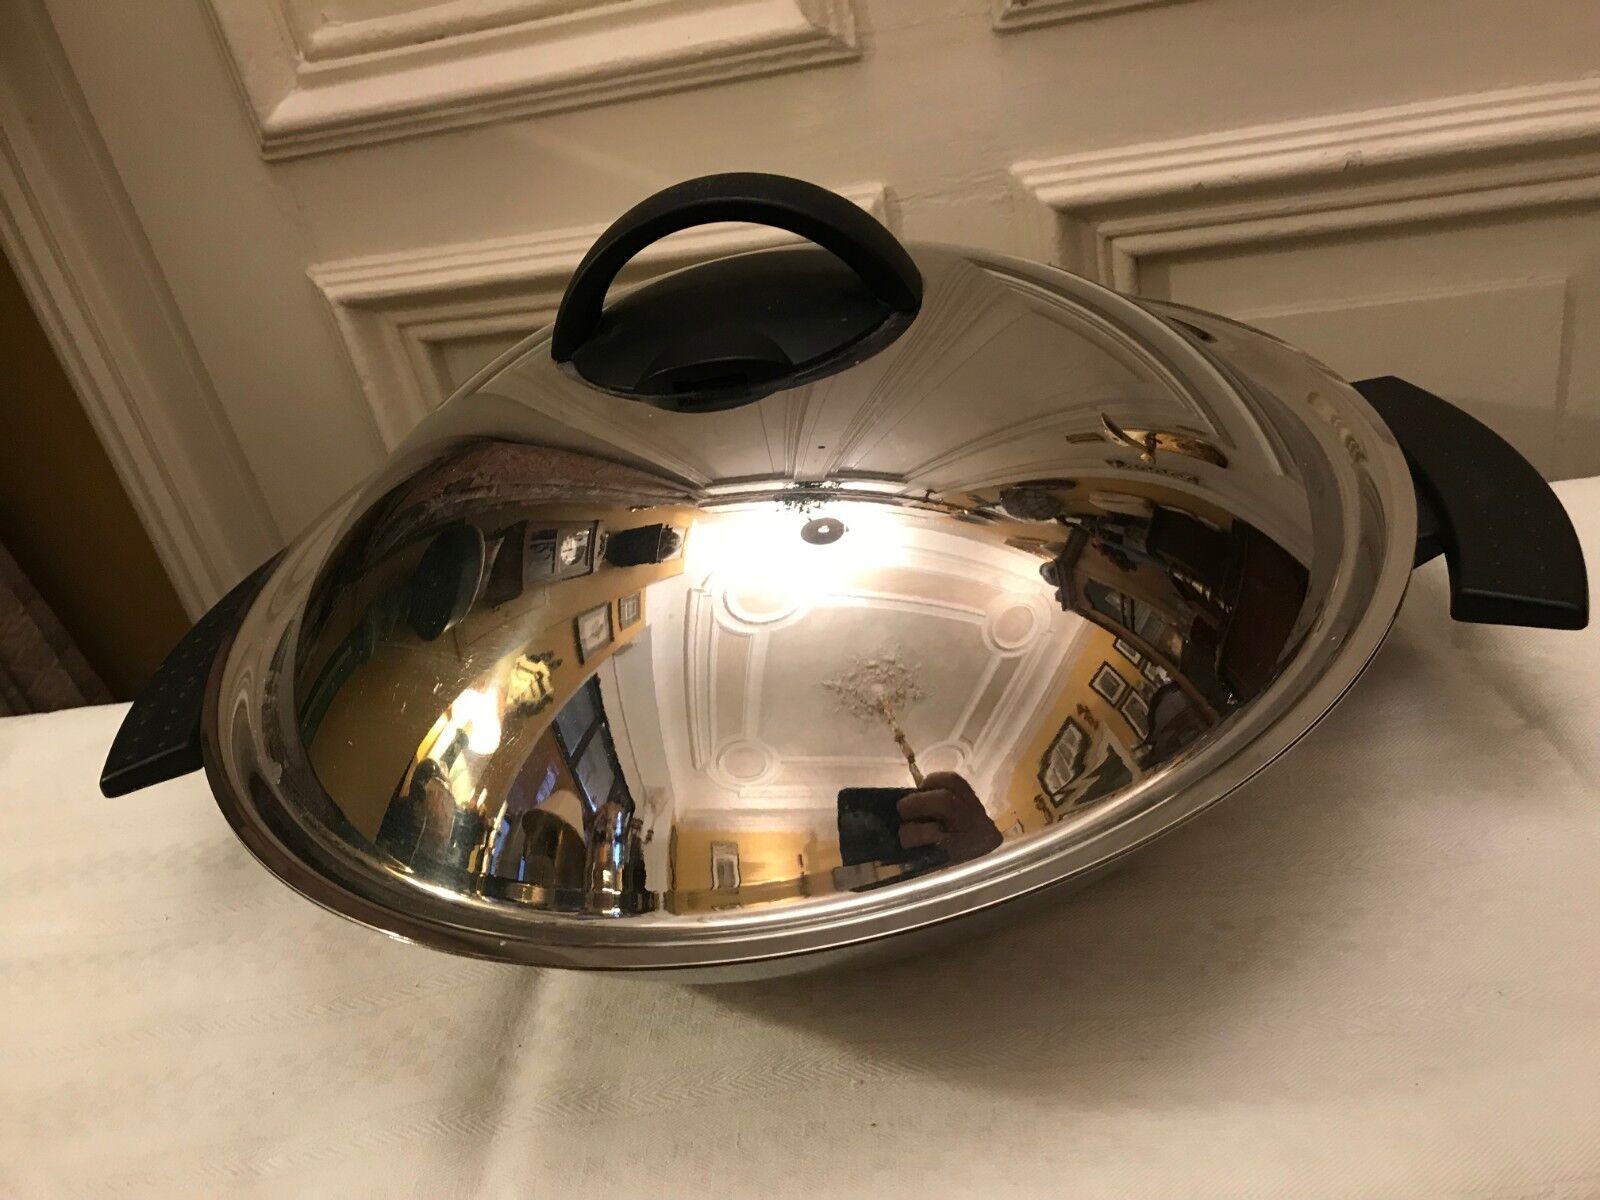 Gigante vitavit Brat - holandés wok ca 38cm de ancho 9 alta (sólo olla) 18 10